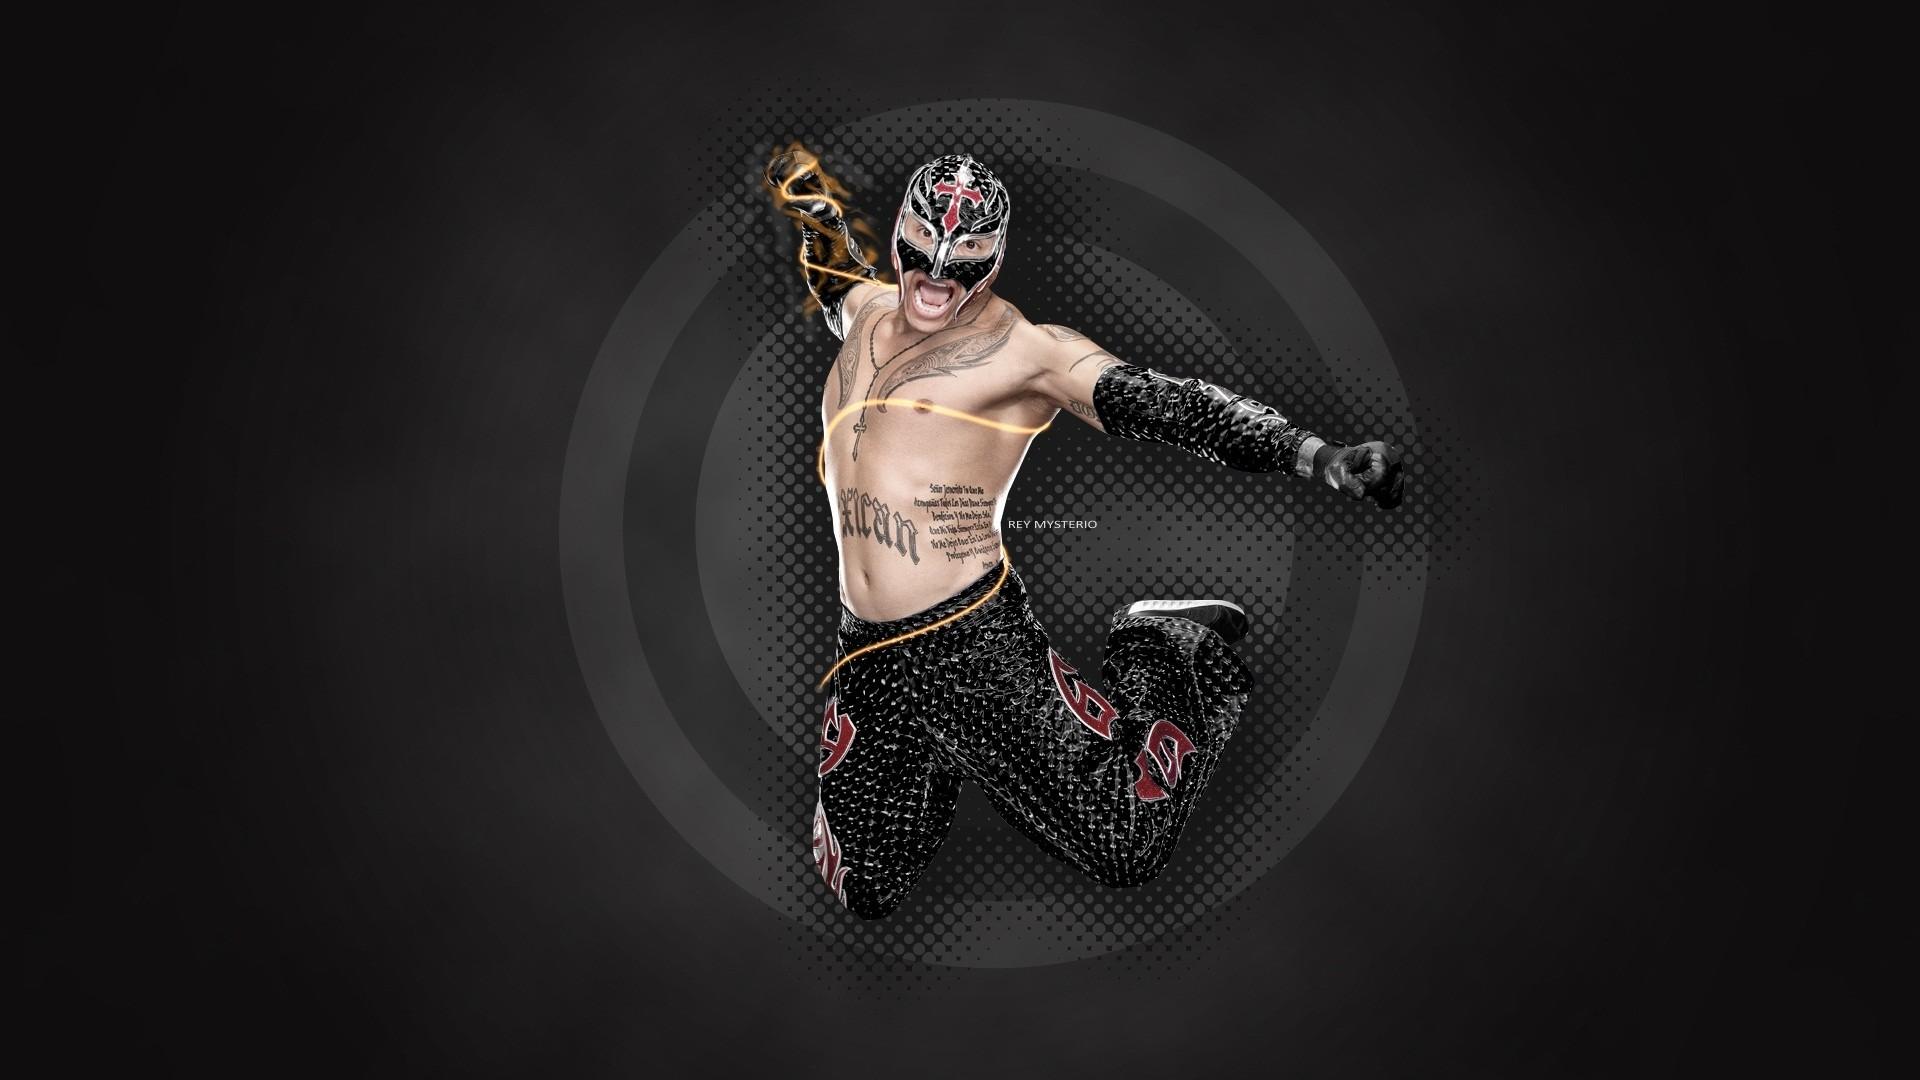 Rey Mysterio Wallpaper – Download wwe Wallpapers, Free wwe .